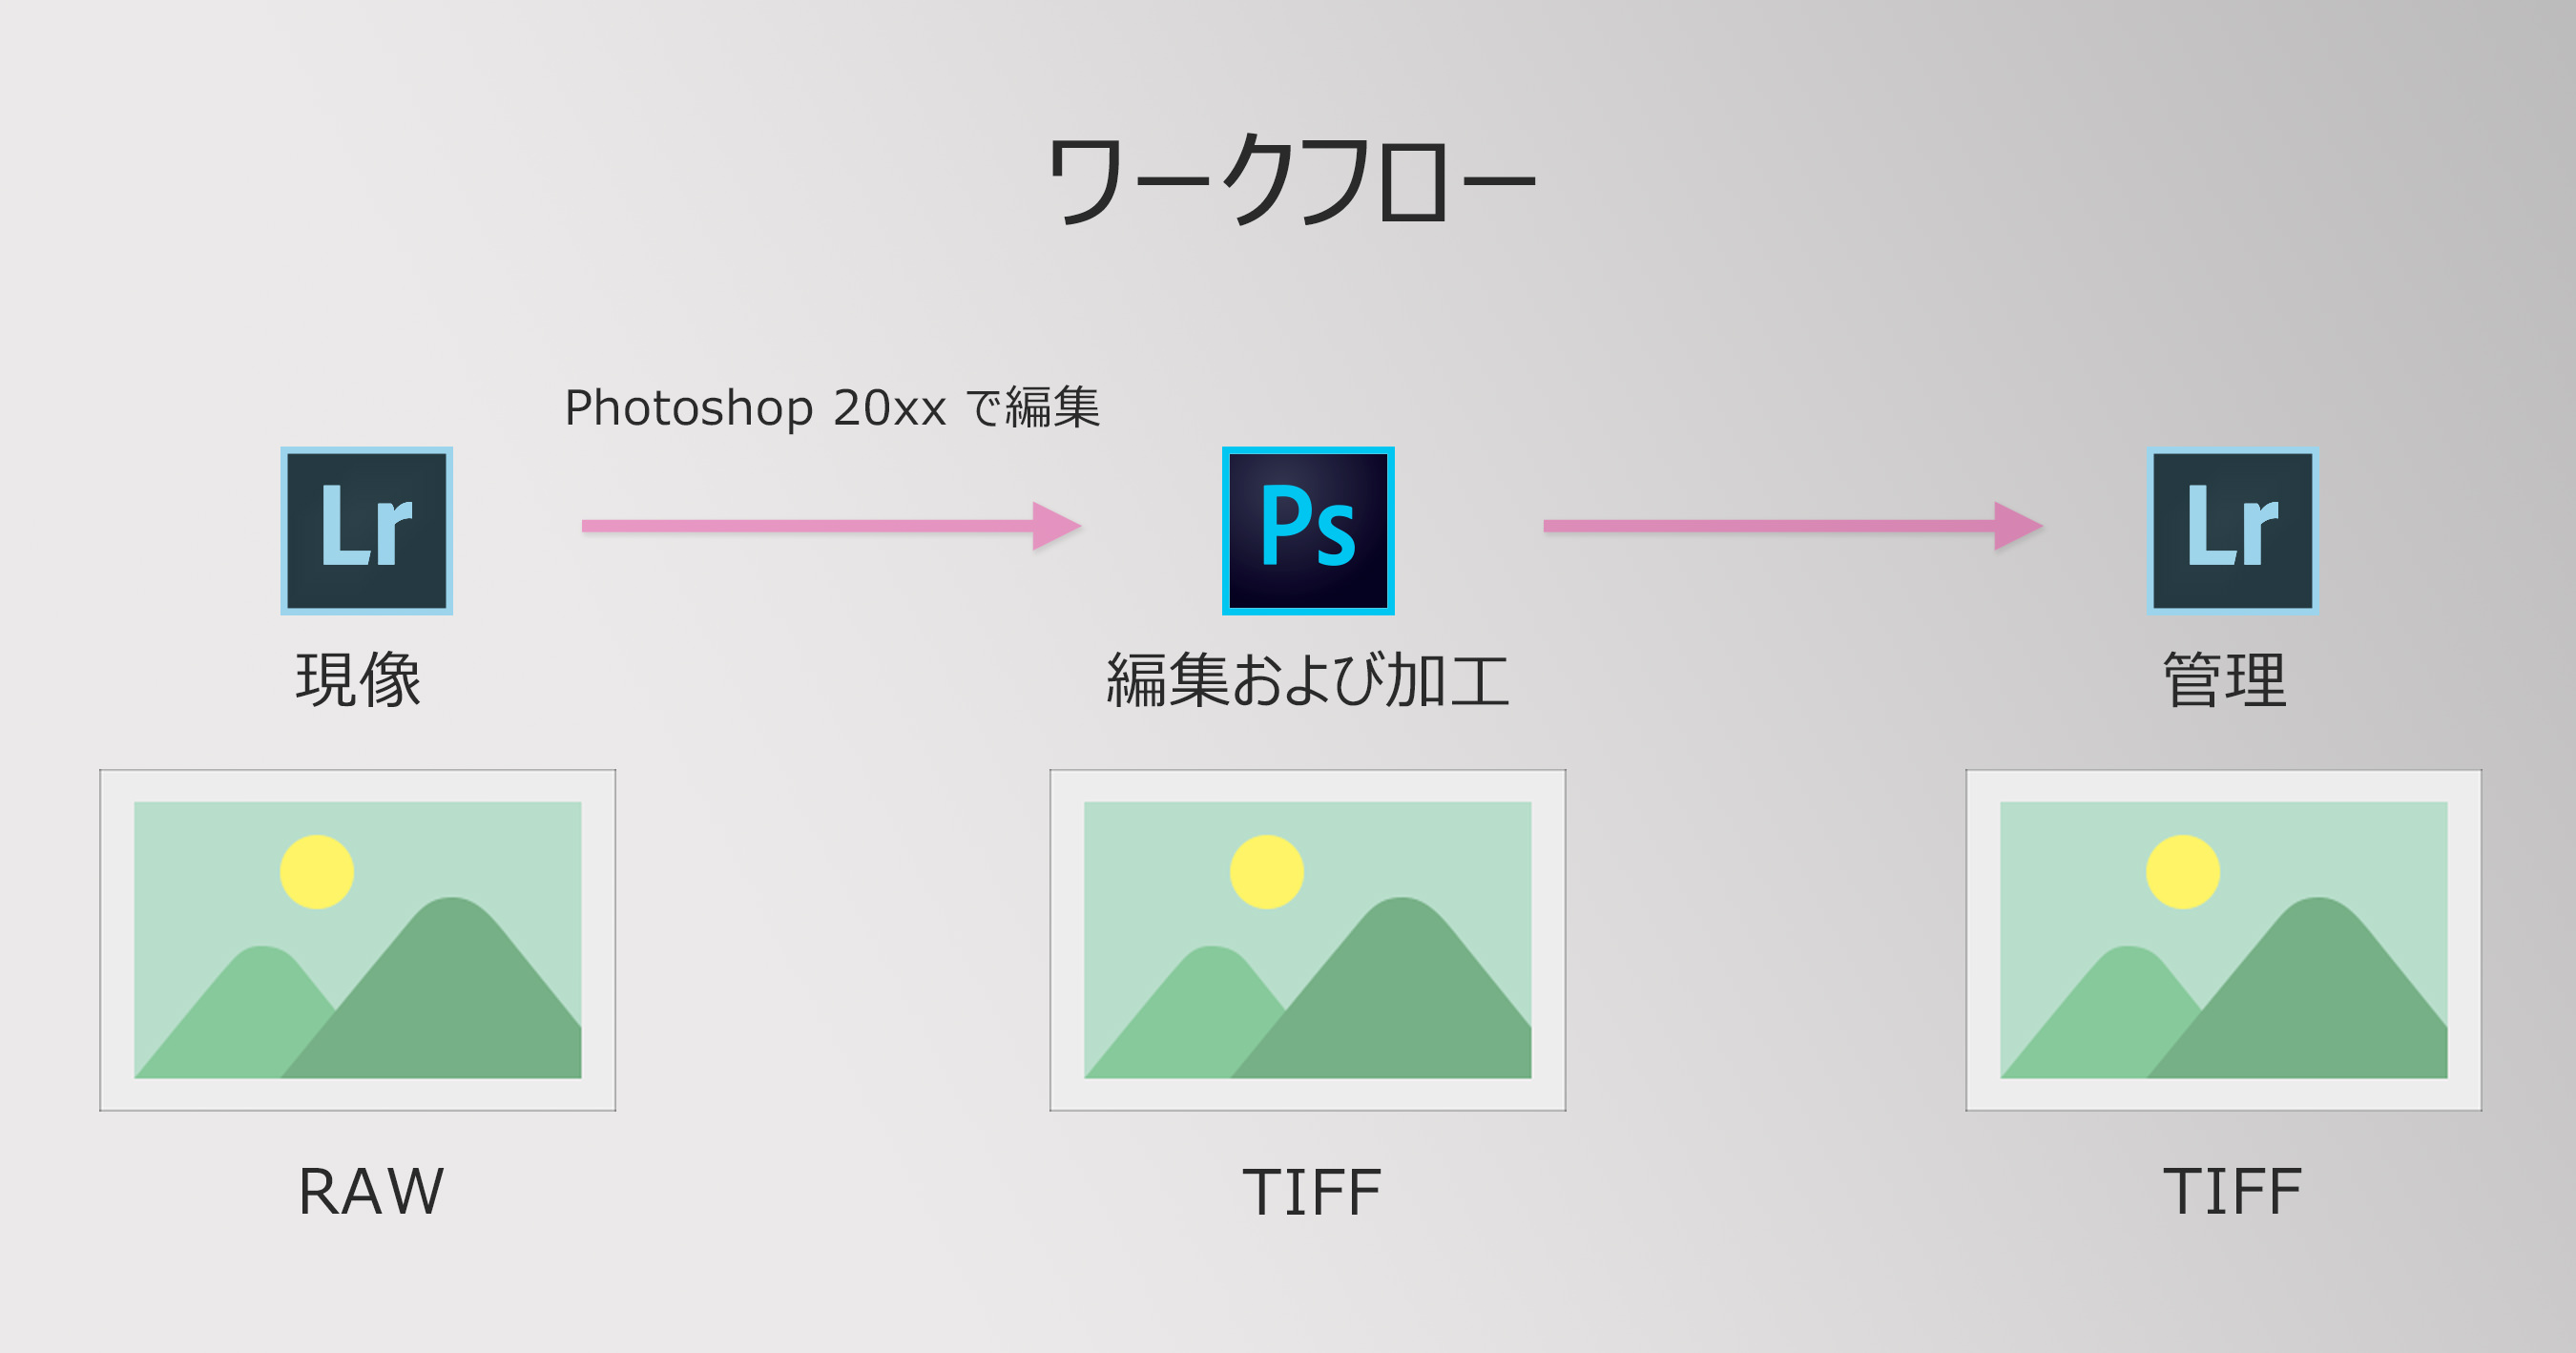 LightroomとPhotoshopを使ったワークフロー(基本編)